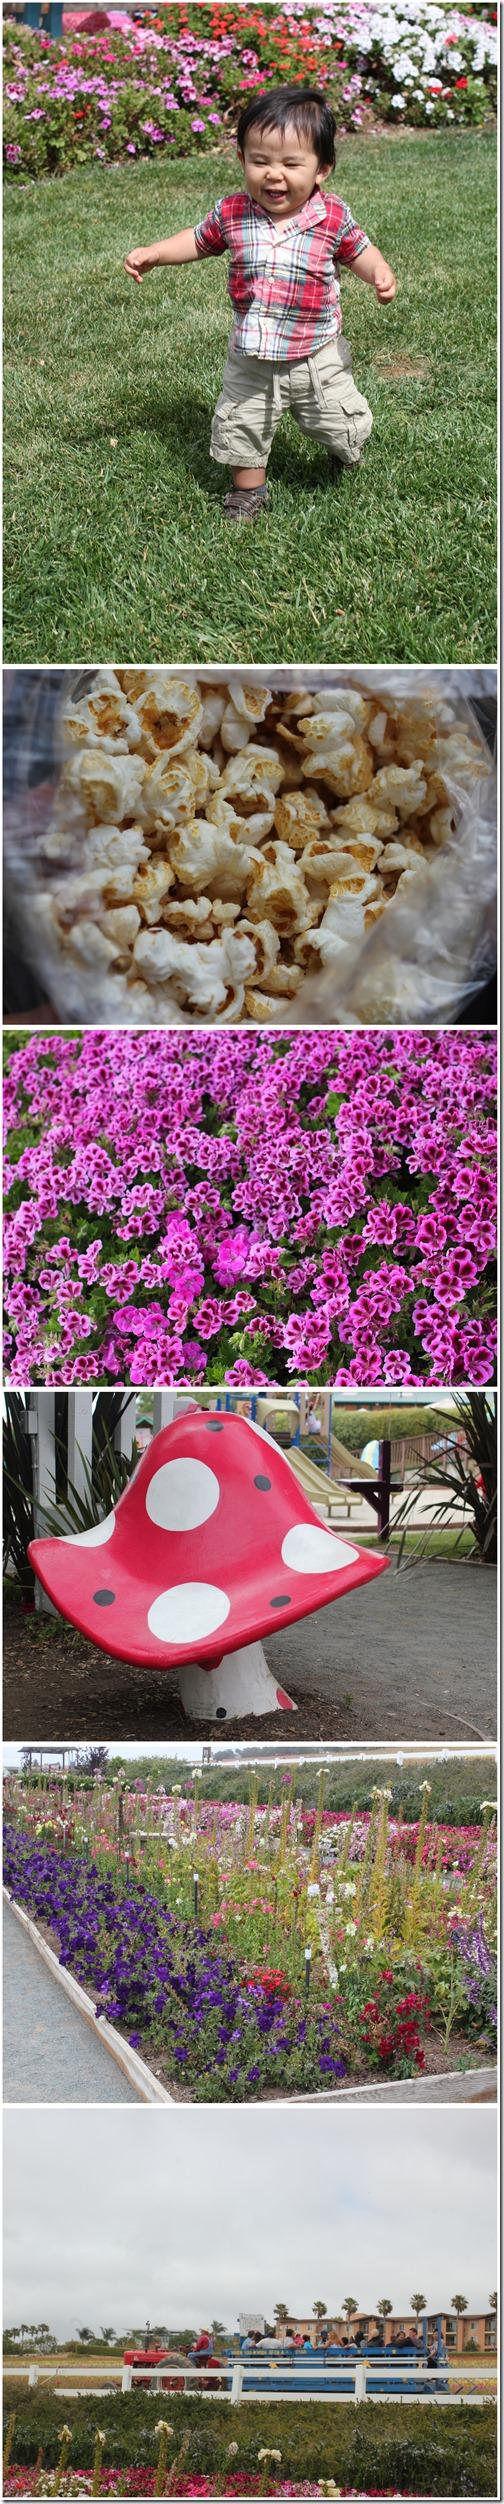 flowerfields_carlsbad2